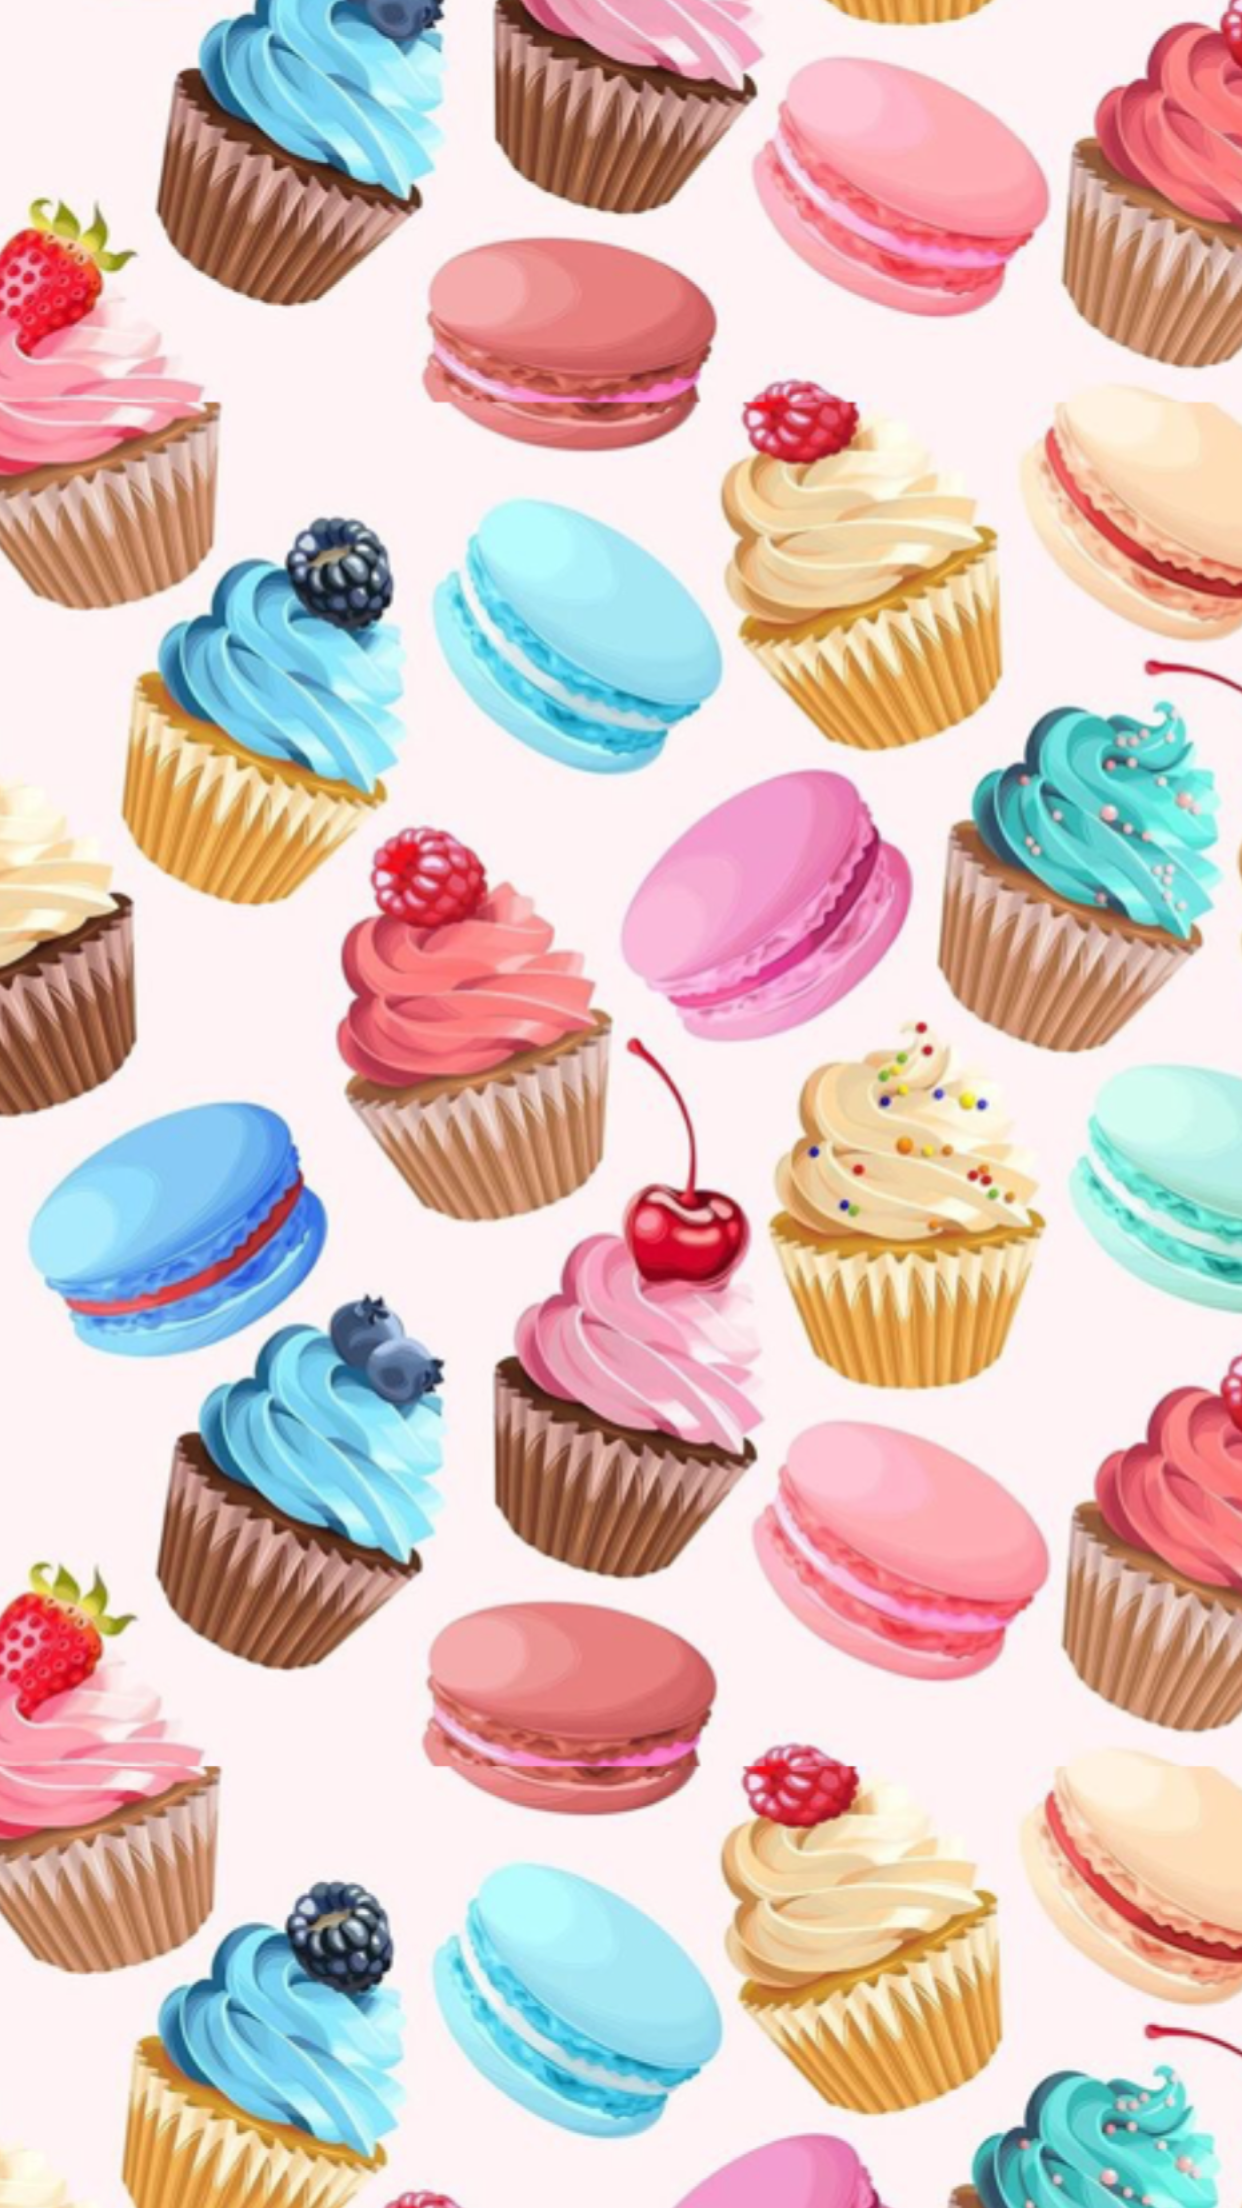 Pin By Ayu Majun On Cupcakes Wallpaper Background Patterns